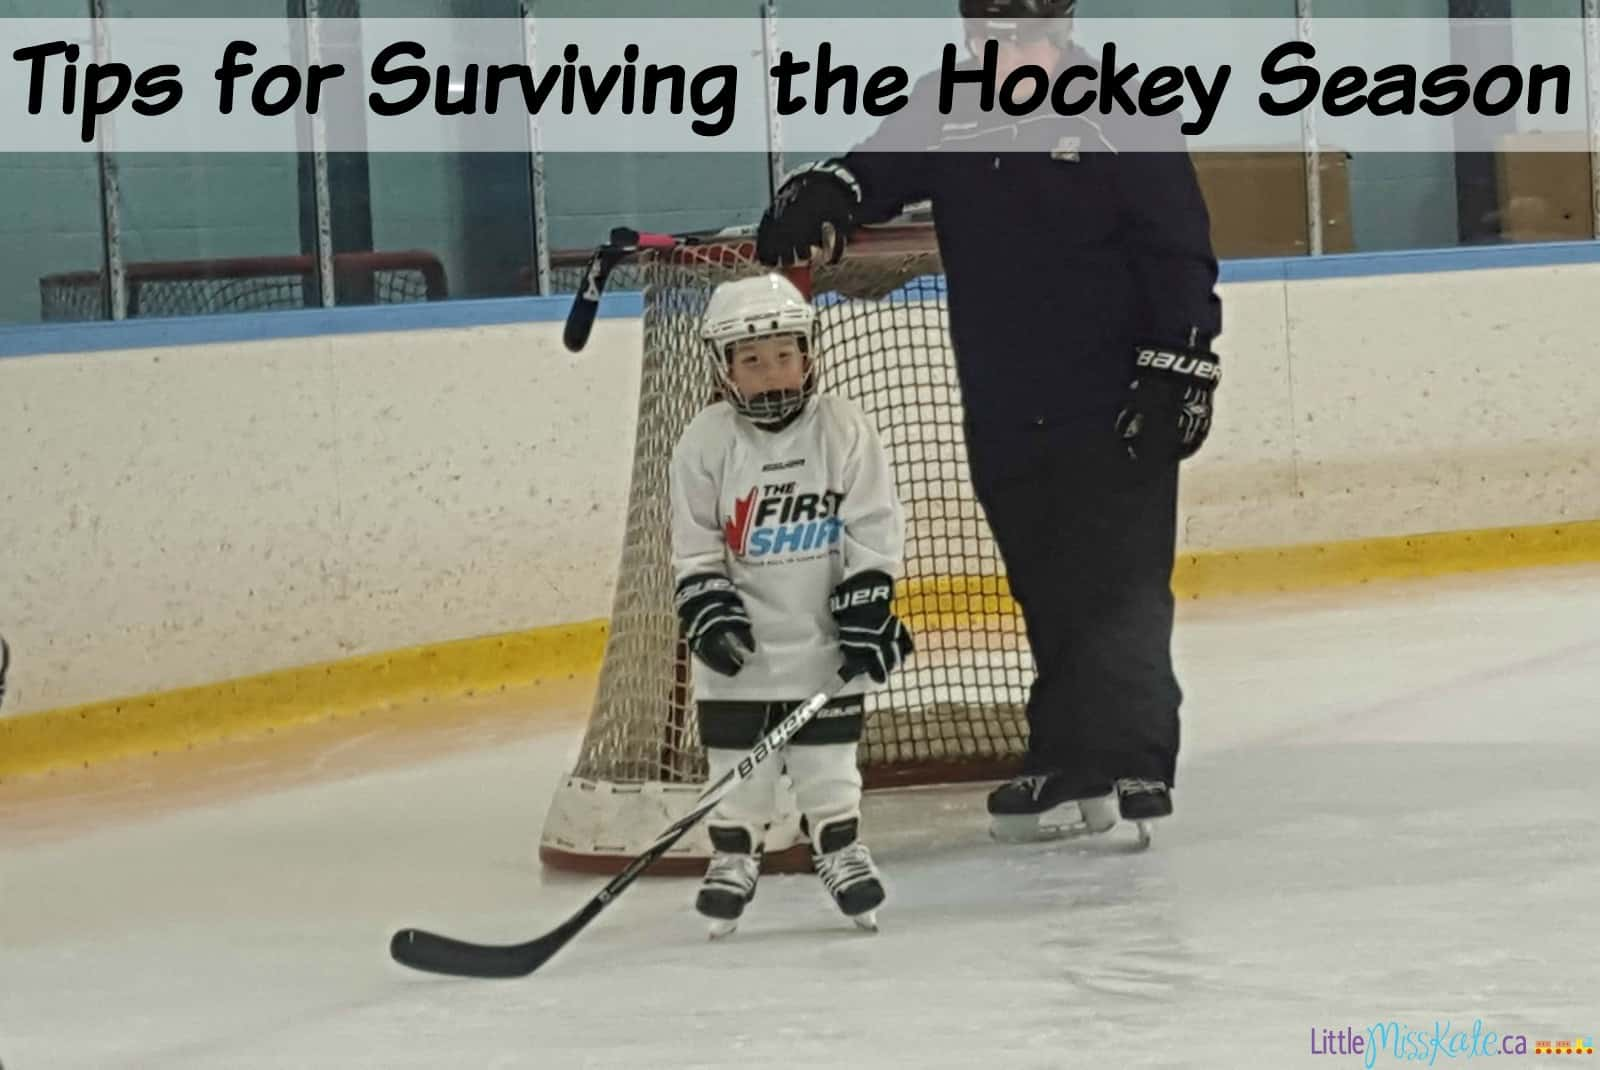 hockey mom tells tips for surviving the hockey season little